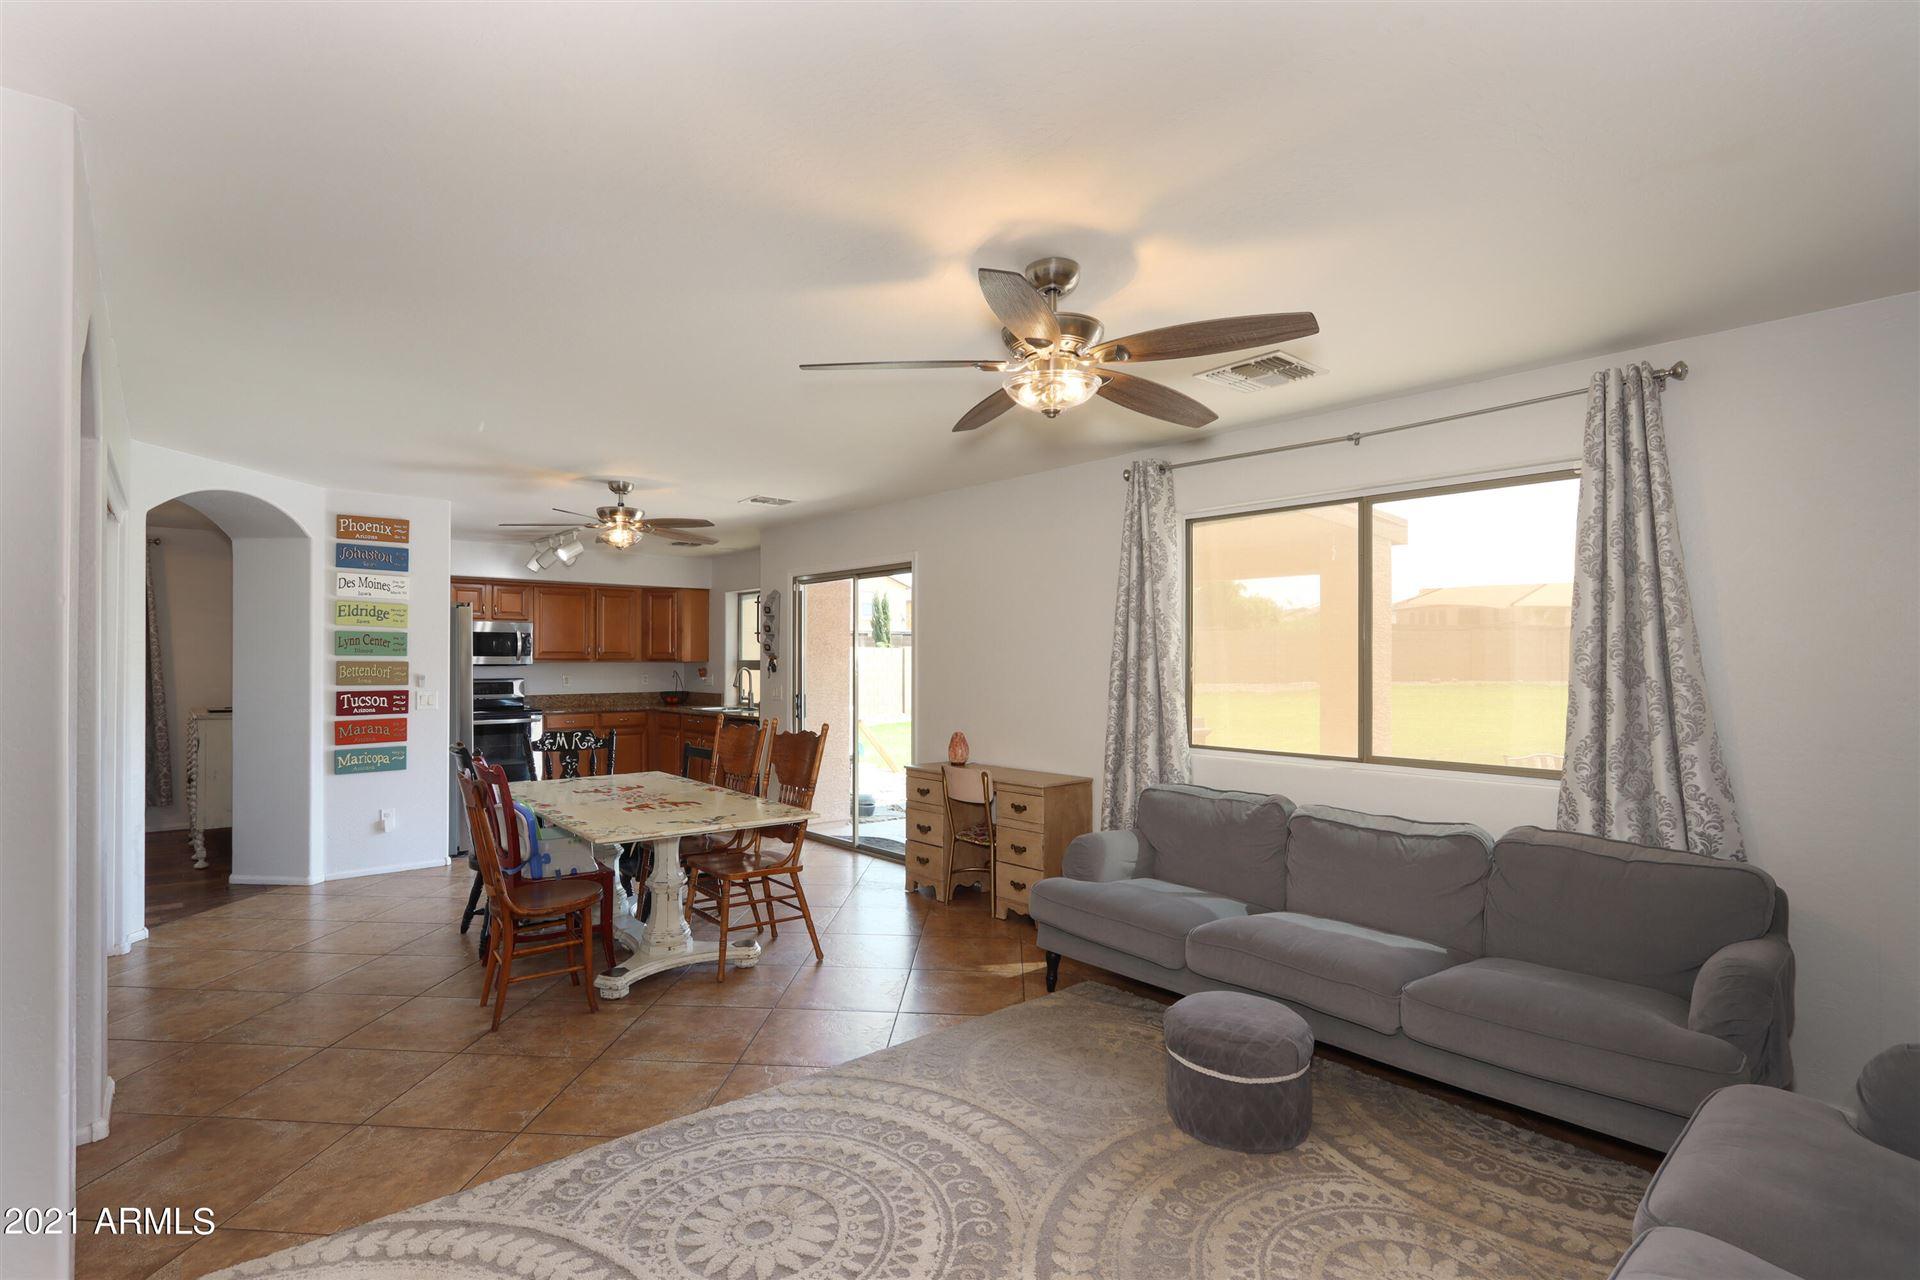 Photo of 21035 N ALEXIS Avenue, Maricopa, AZ 85138 (MLS # 6294602)